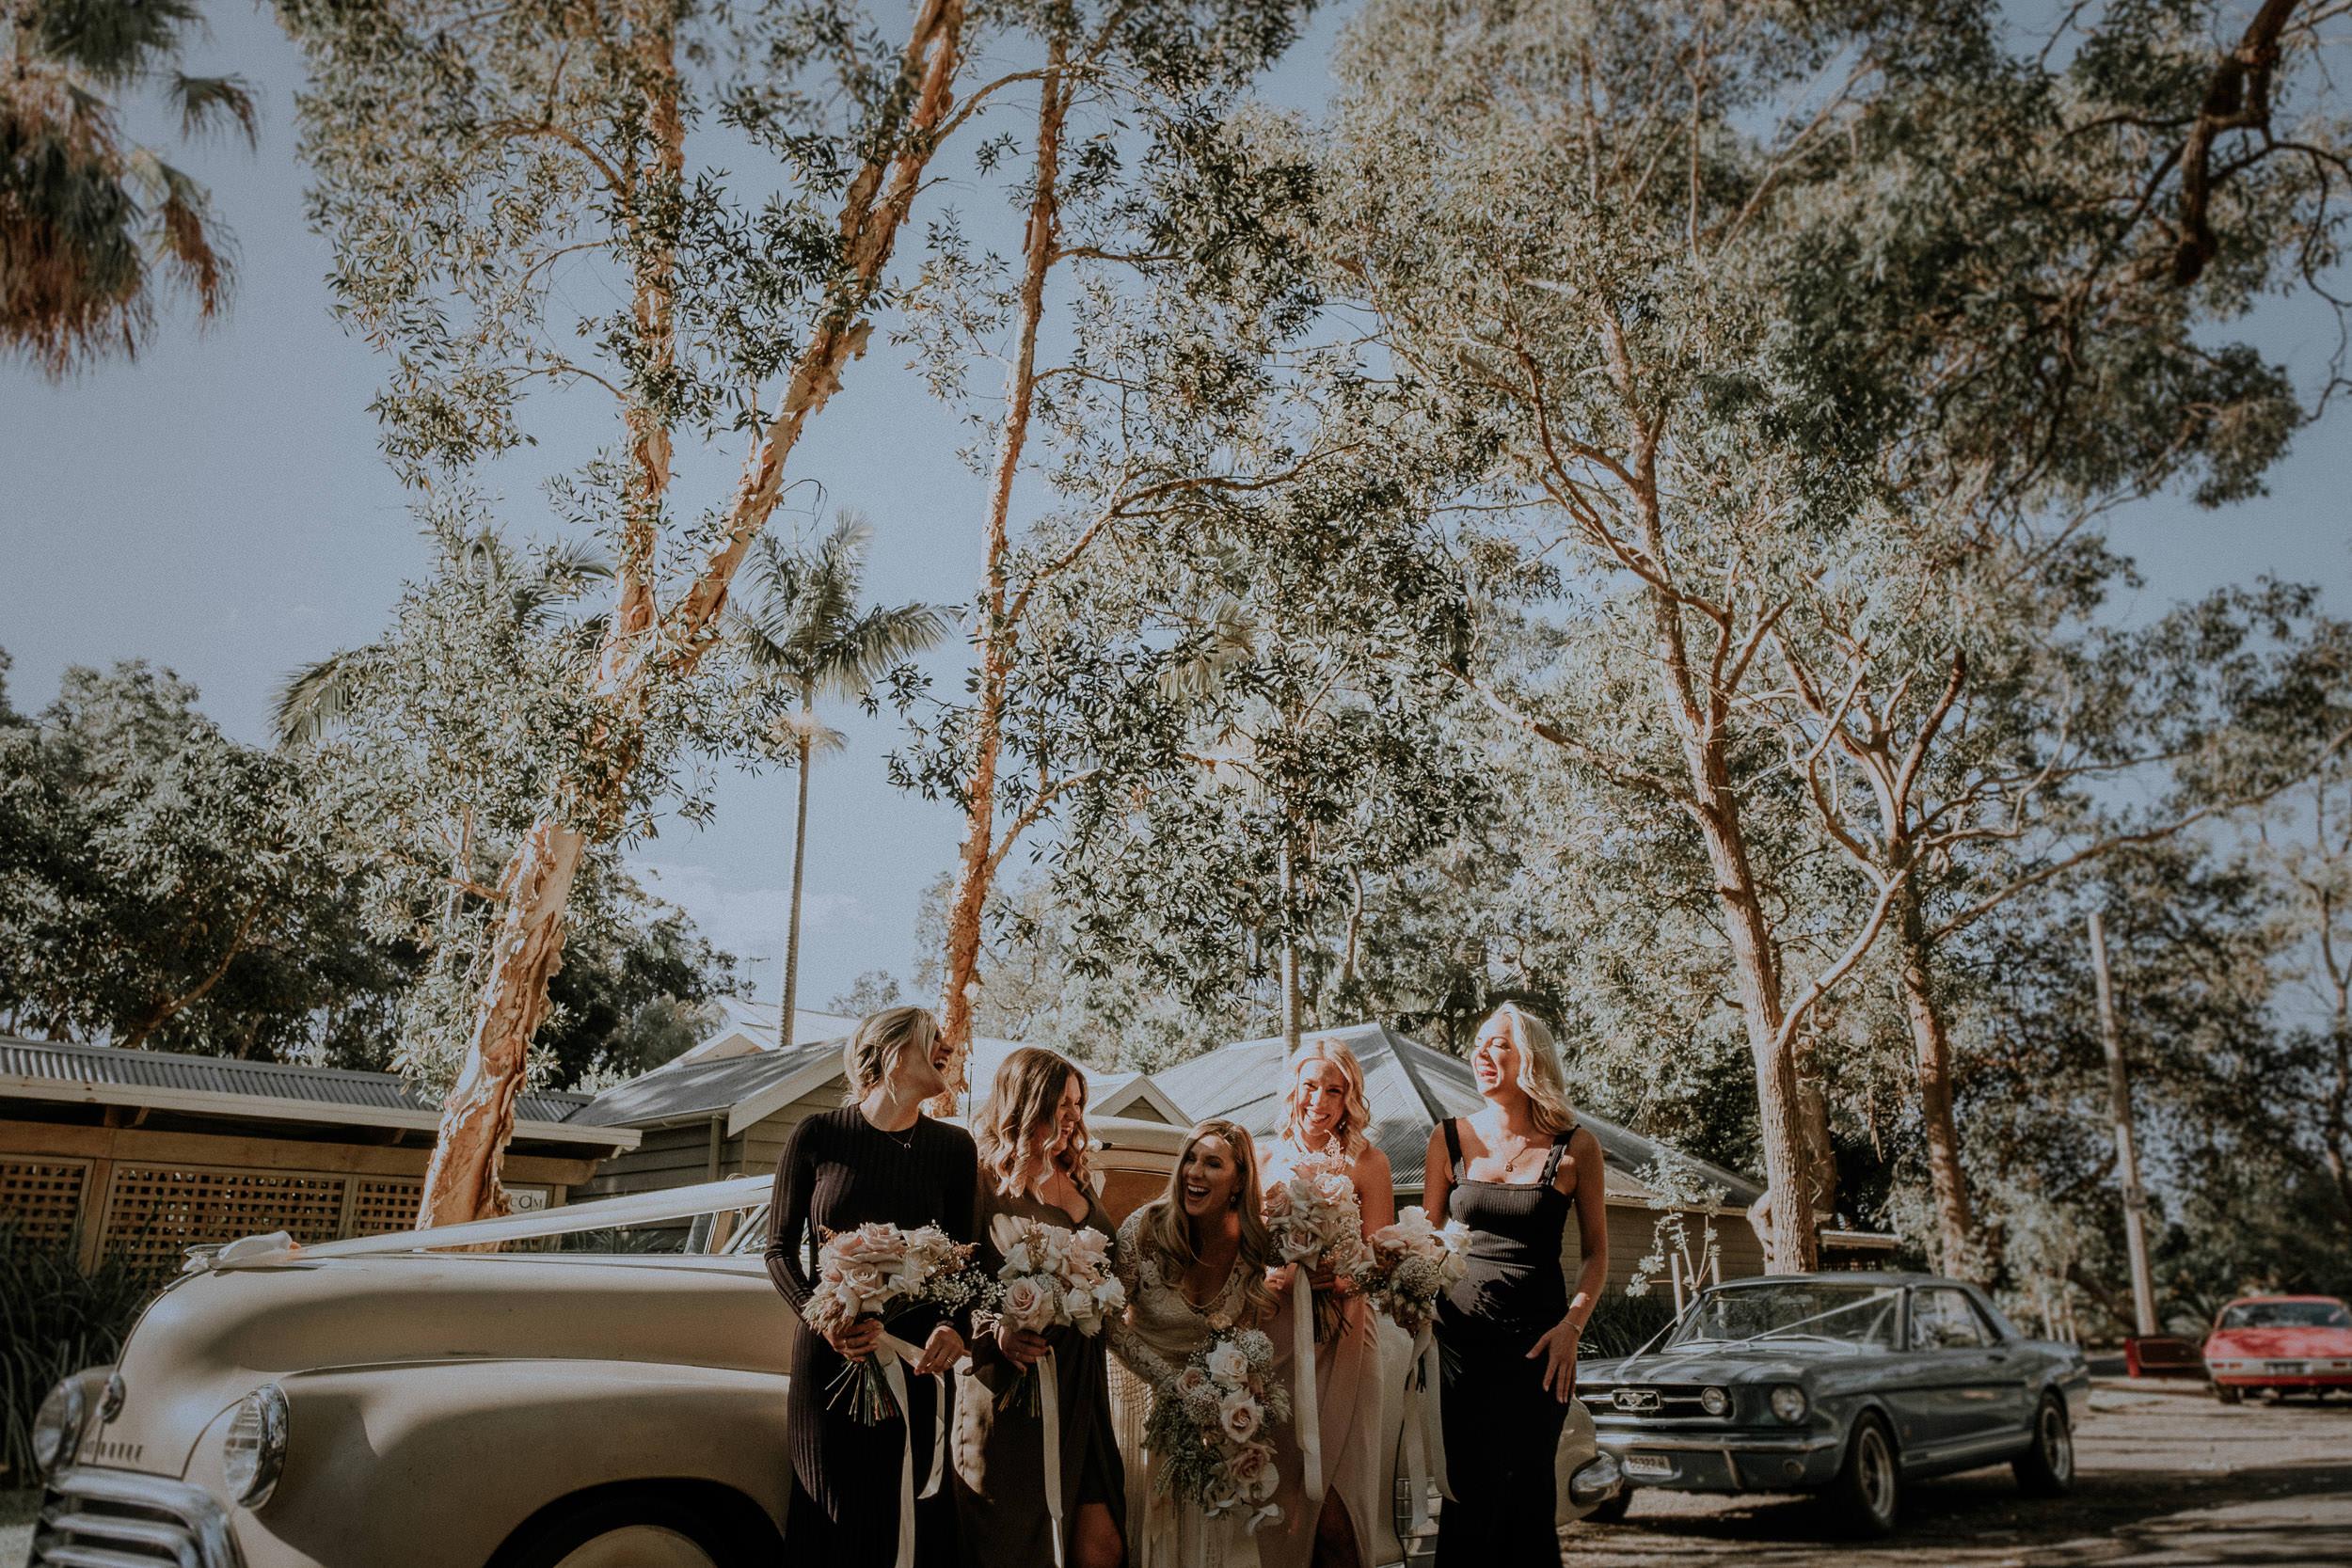 S&A Elopement - Kings & Thieves - Shred 'Til Dead - Central Coast Beach Forest Wedding - 129.jpg